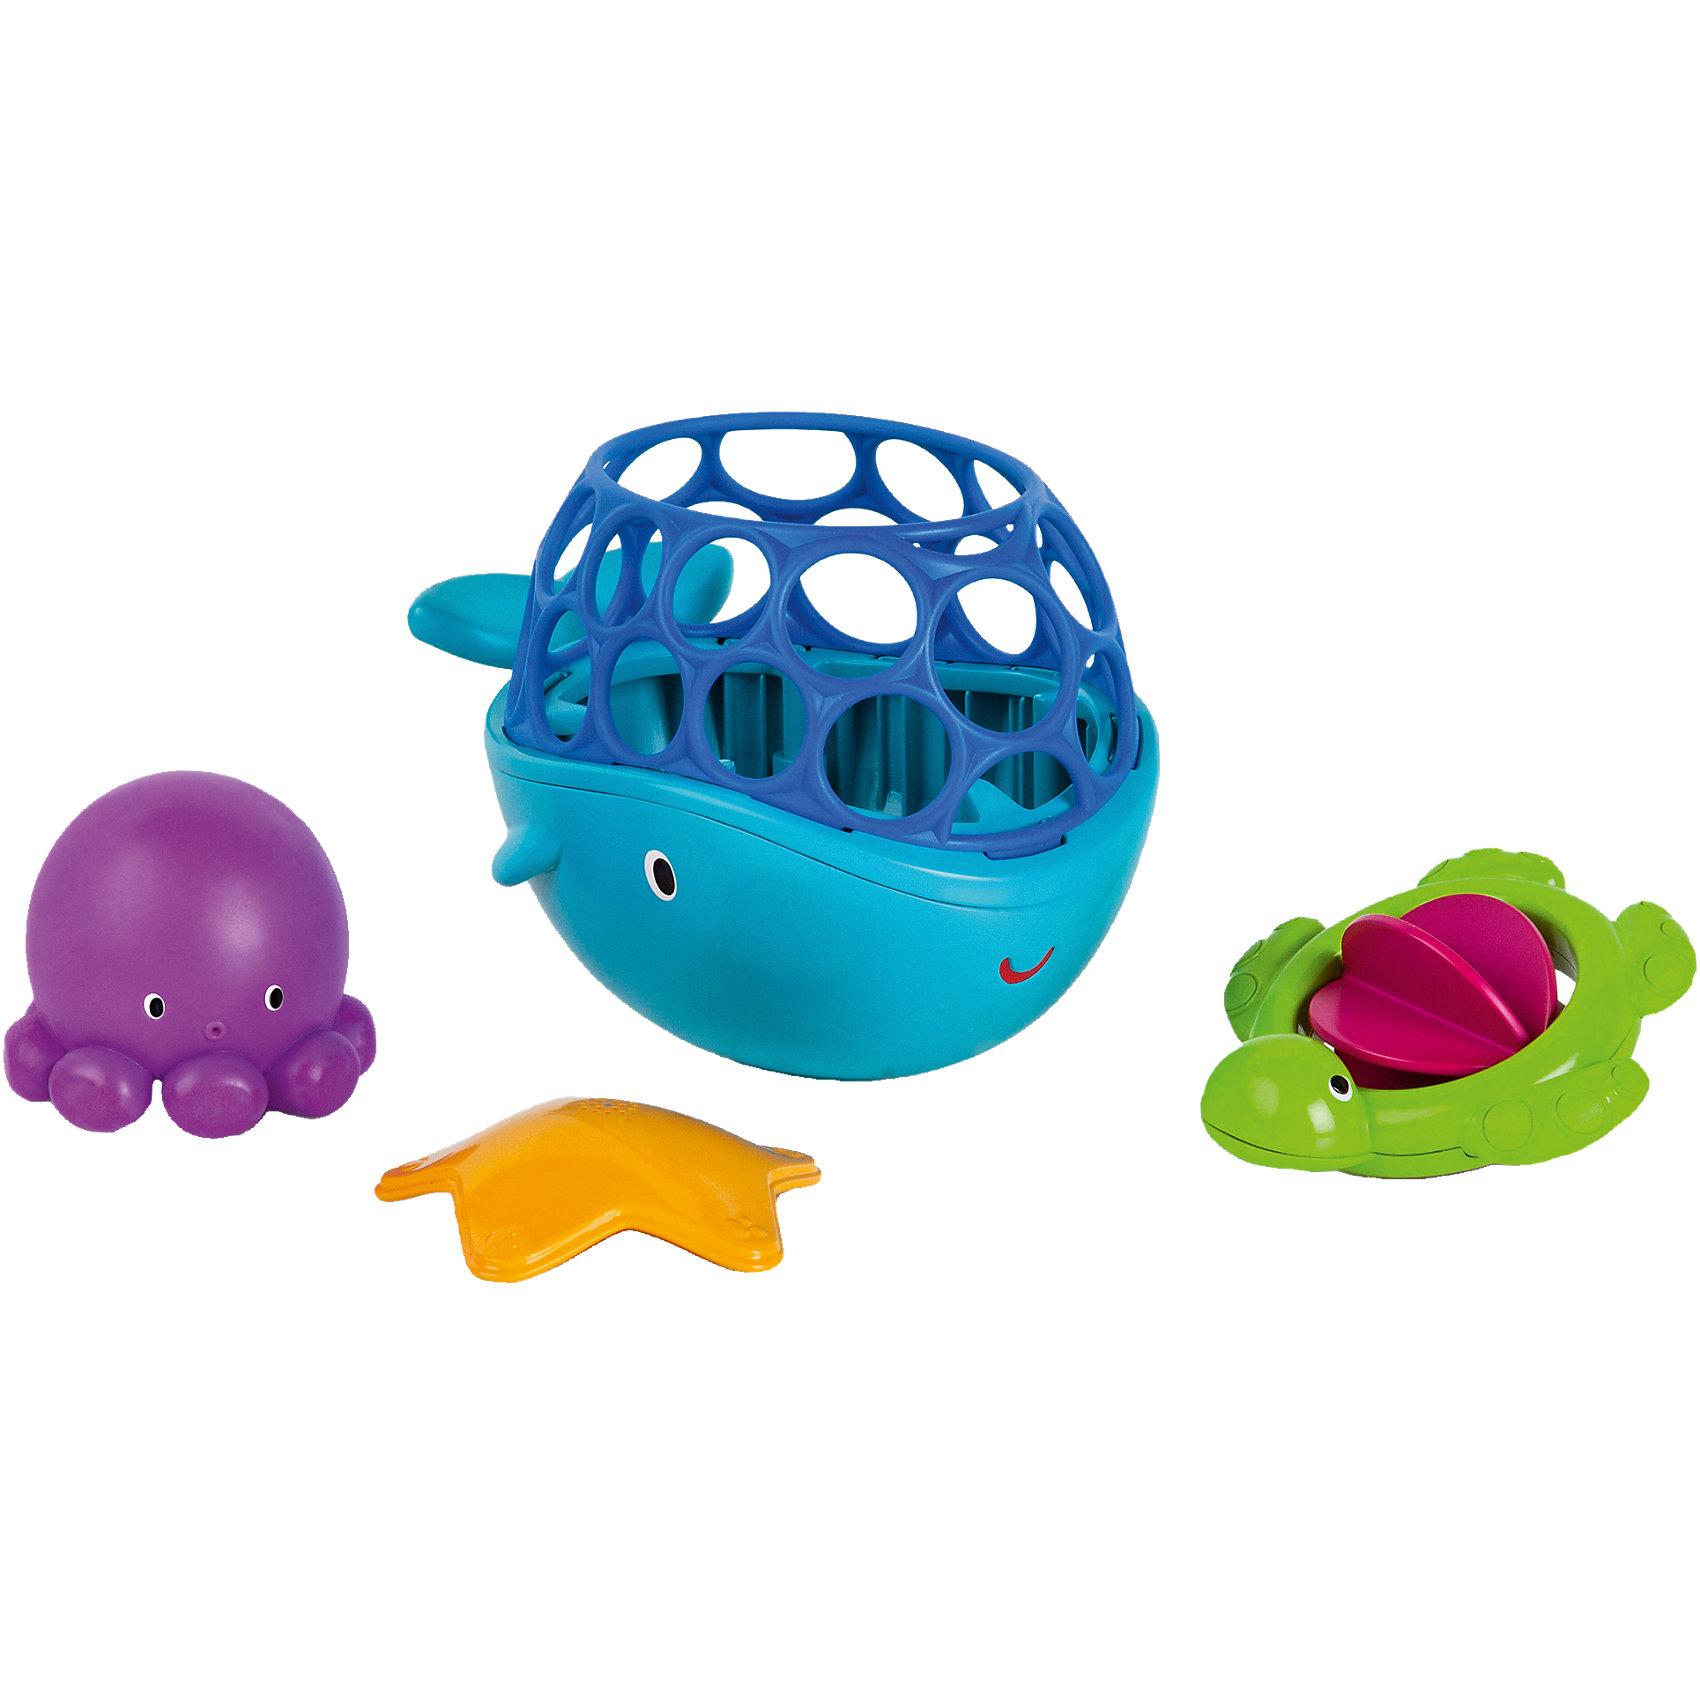 Игрушки для ванны «Морские друзья», Oball от myToys